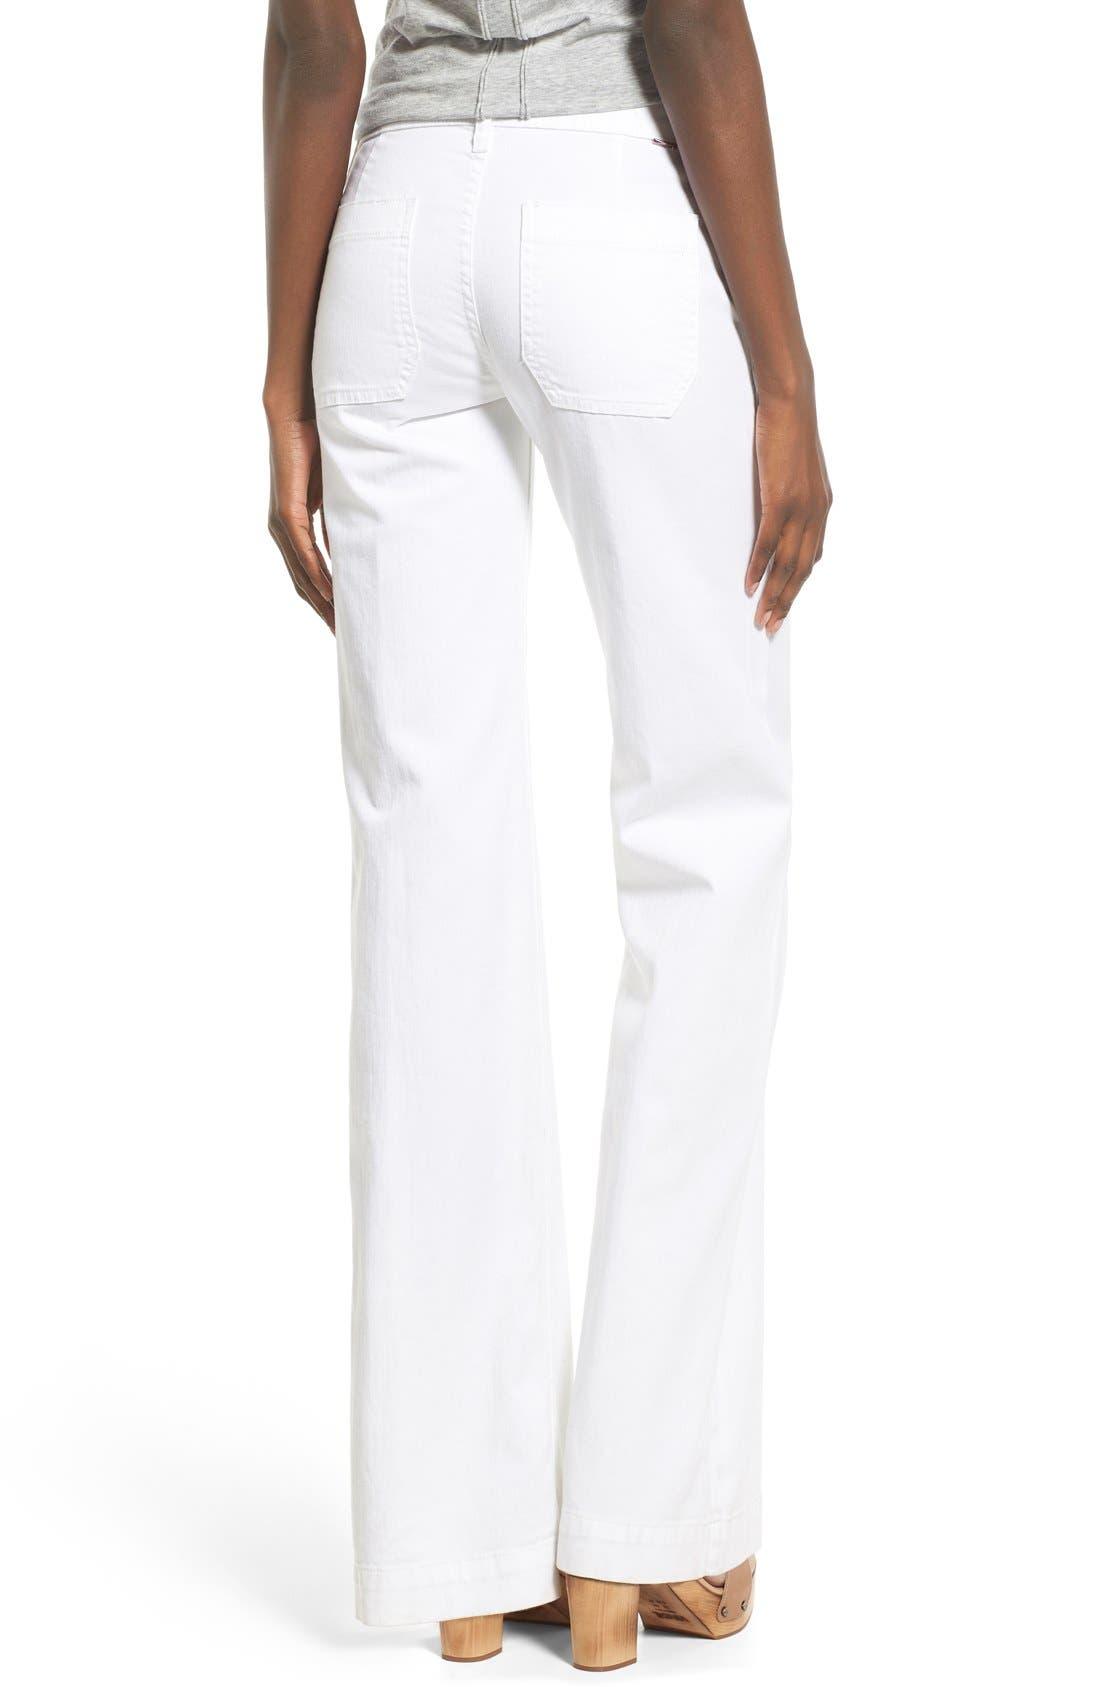 'Libby' Wide Leg Sailor Jeans,                             Alternate thumbnail 2, color,                             White2